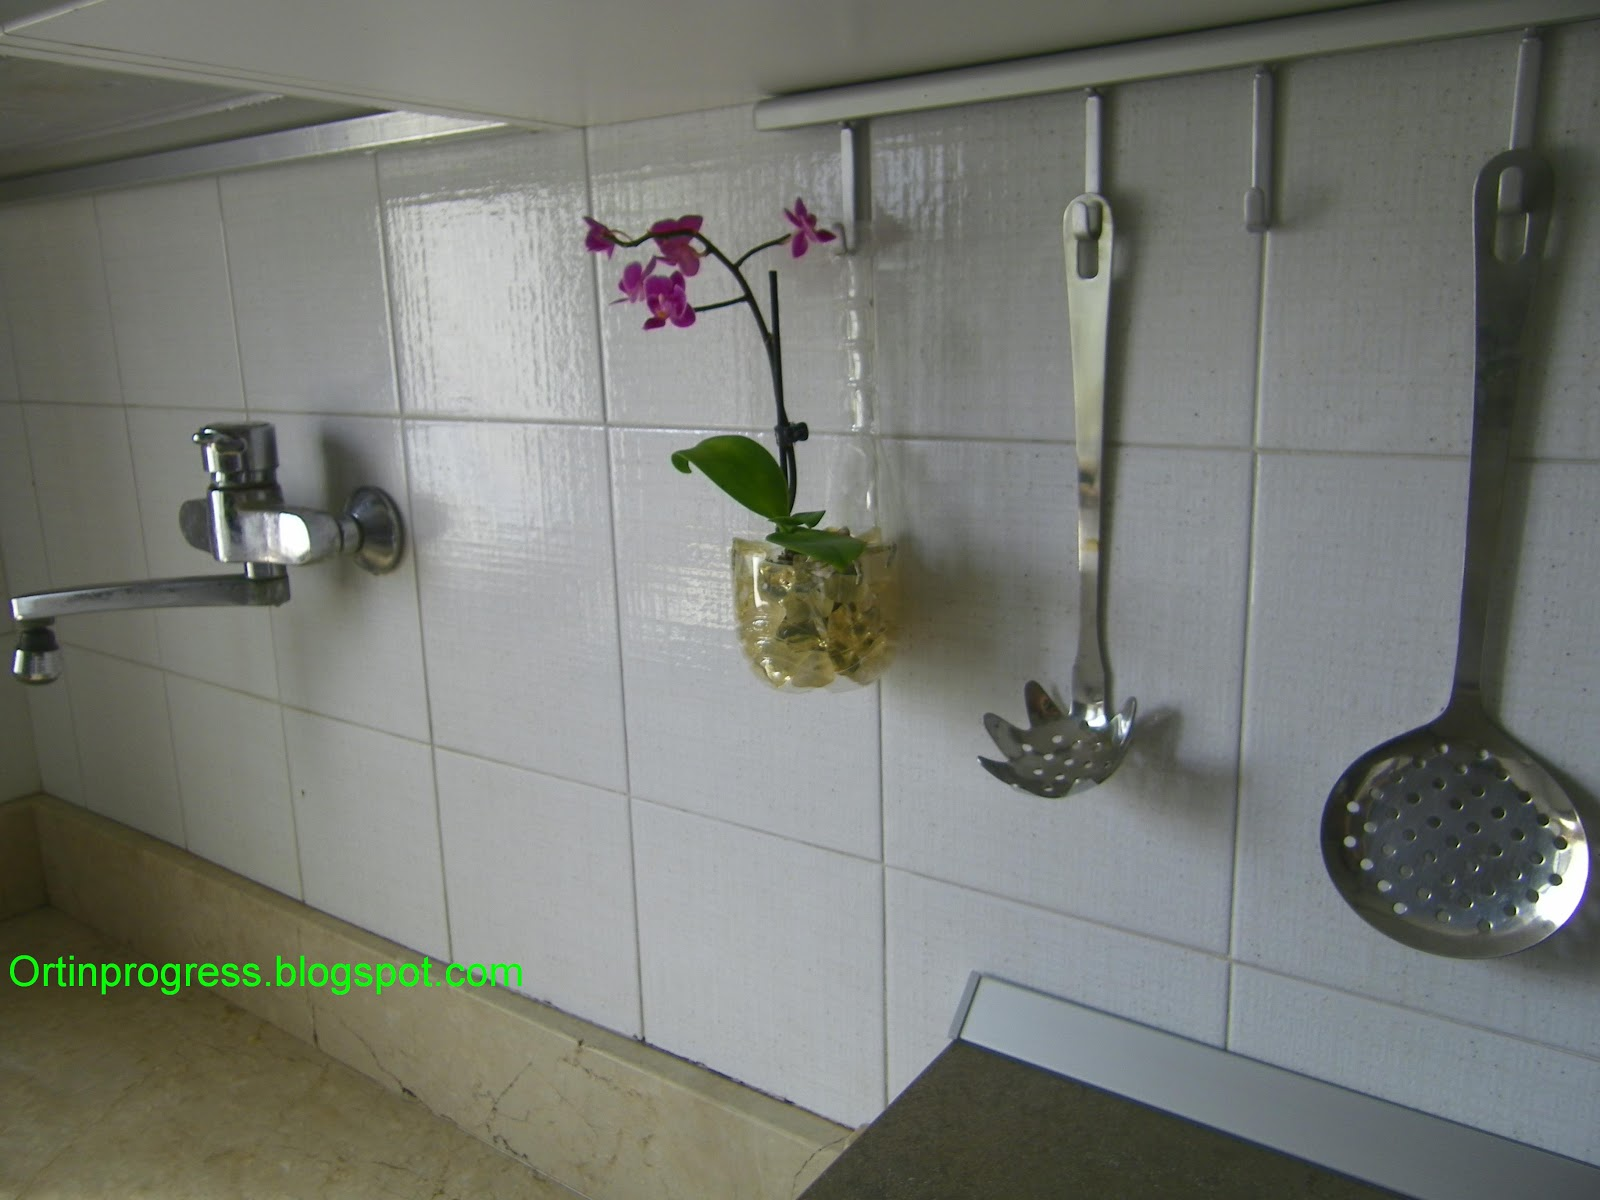 Orti in progress perch tenere l 39 orchidea in cucina - Sassi decorativi ikea ...